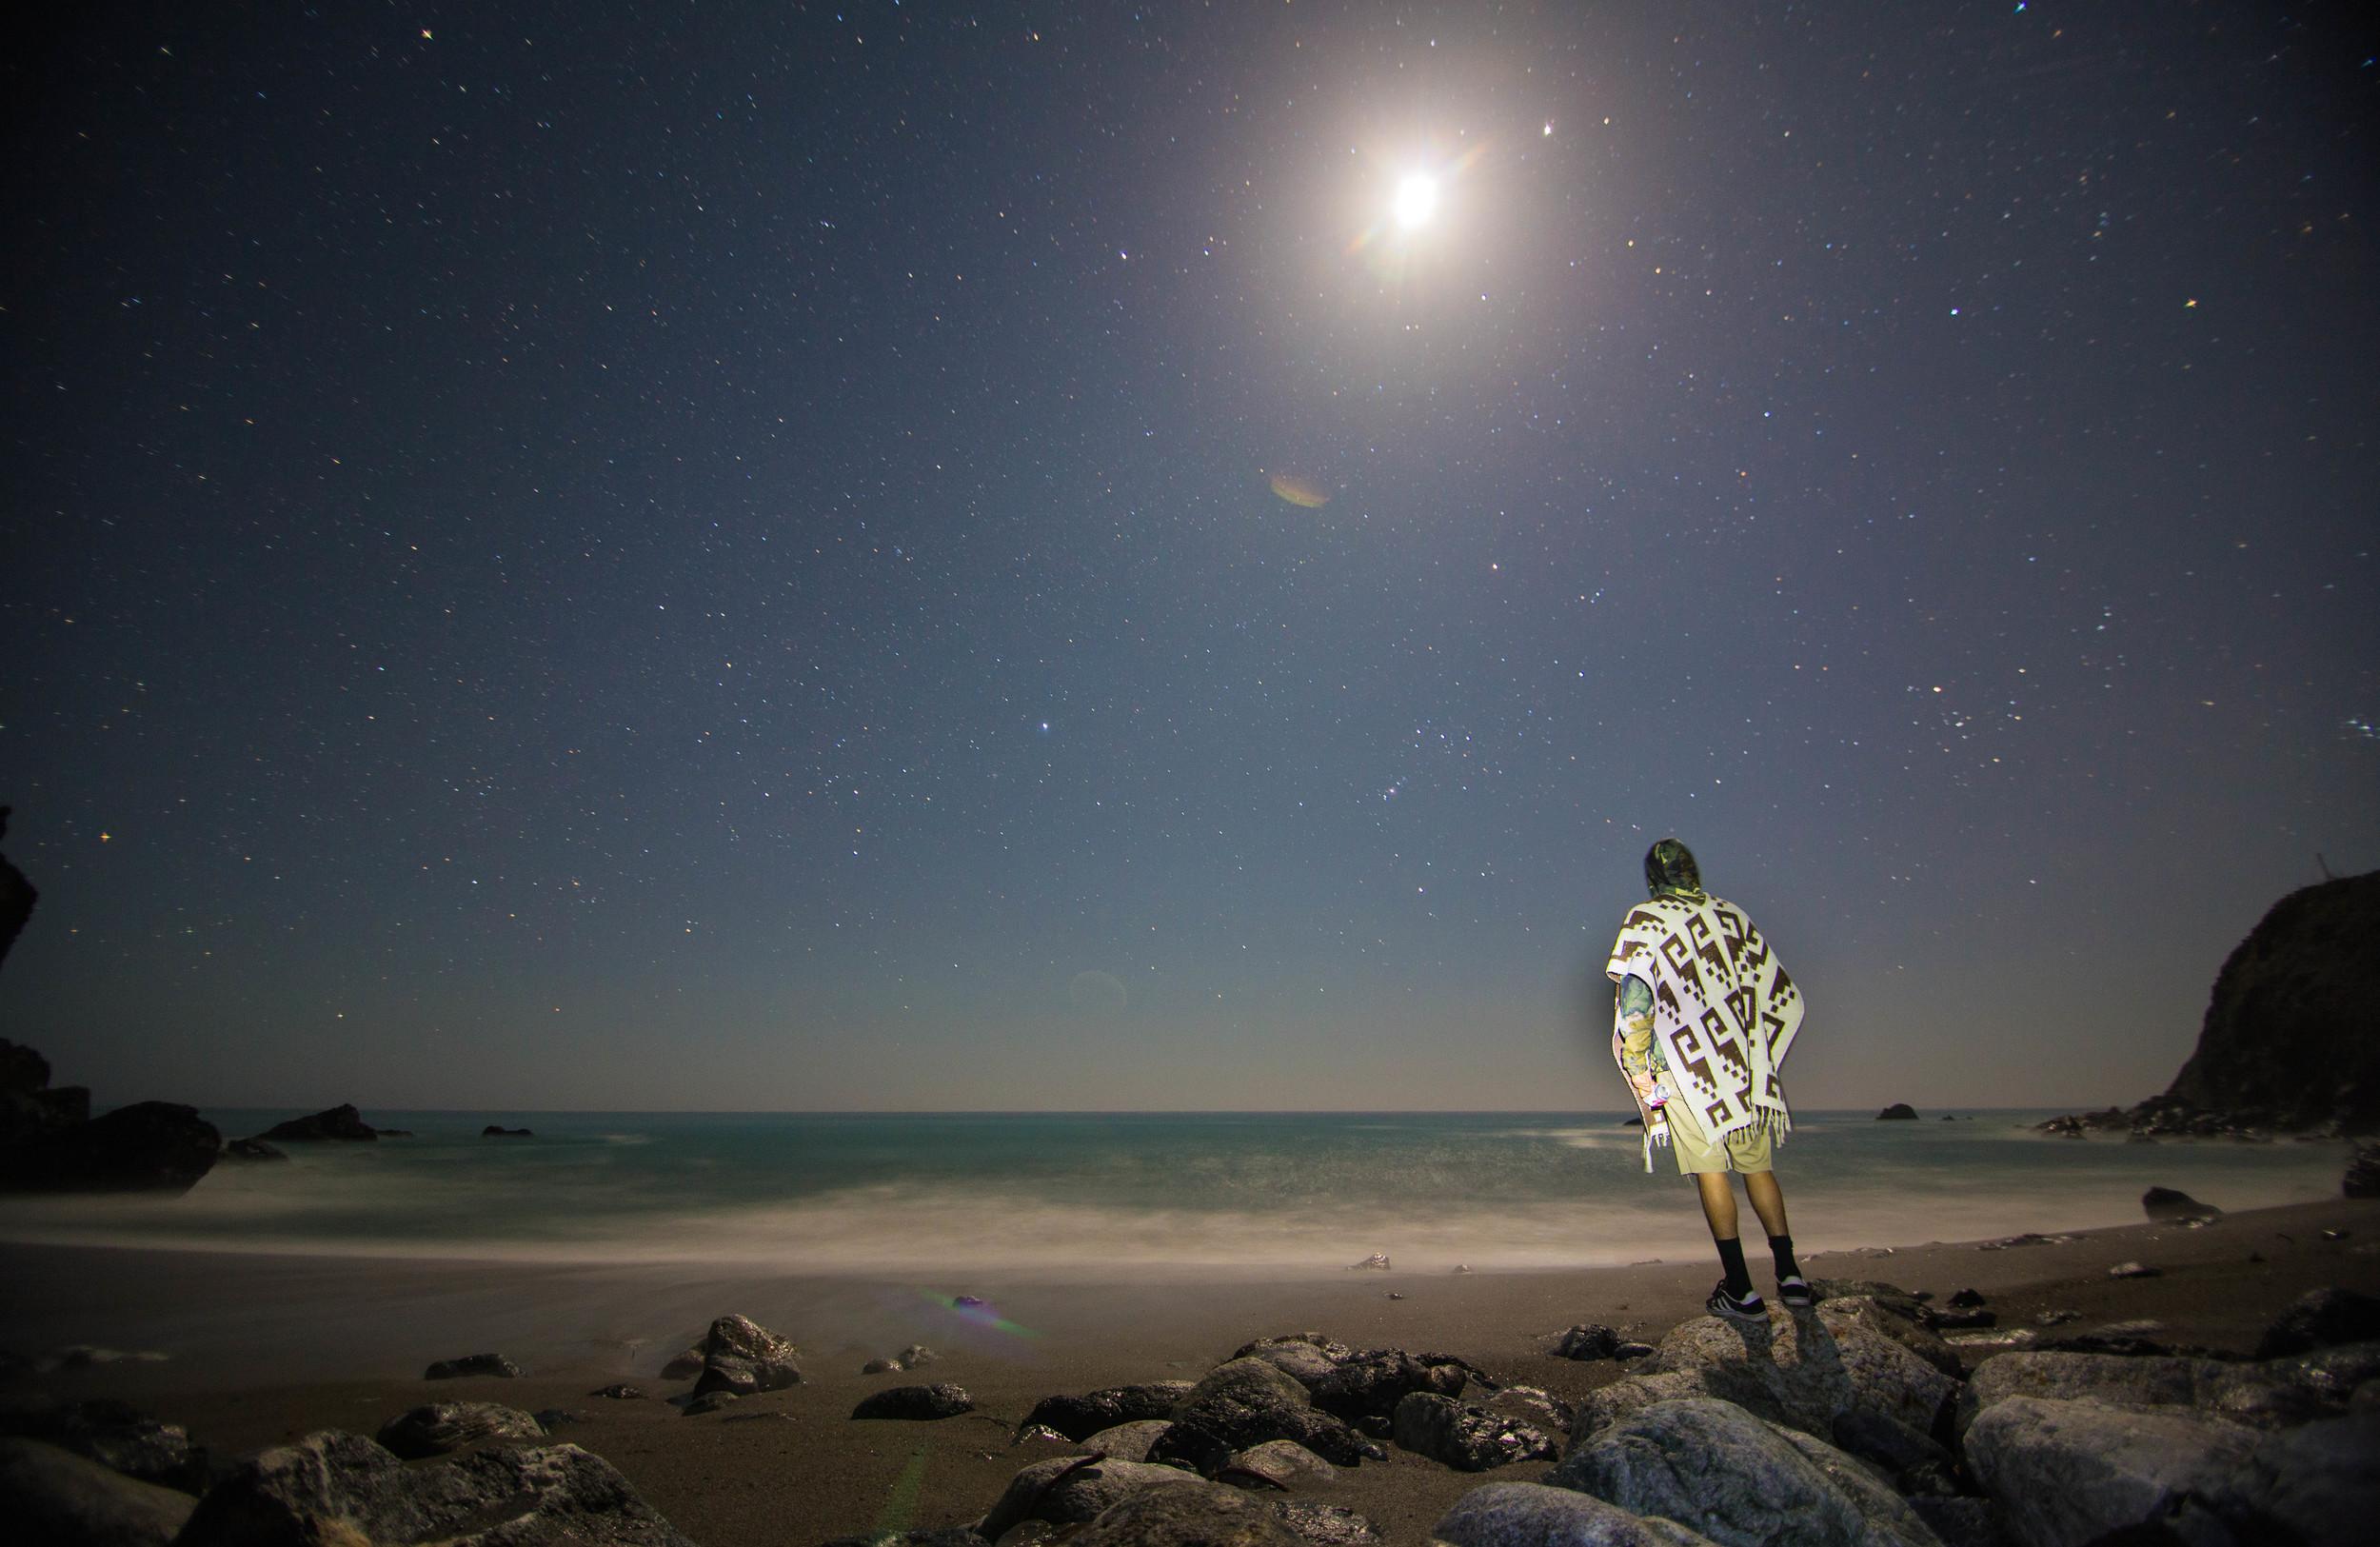 roman on the beach-7860.jpg